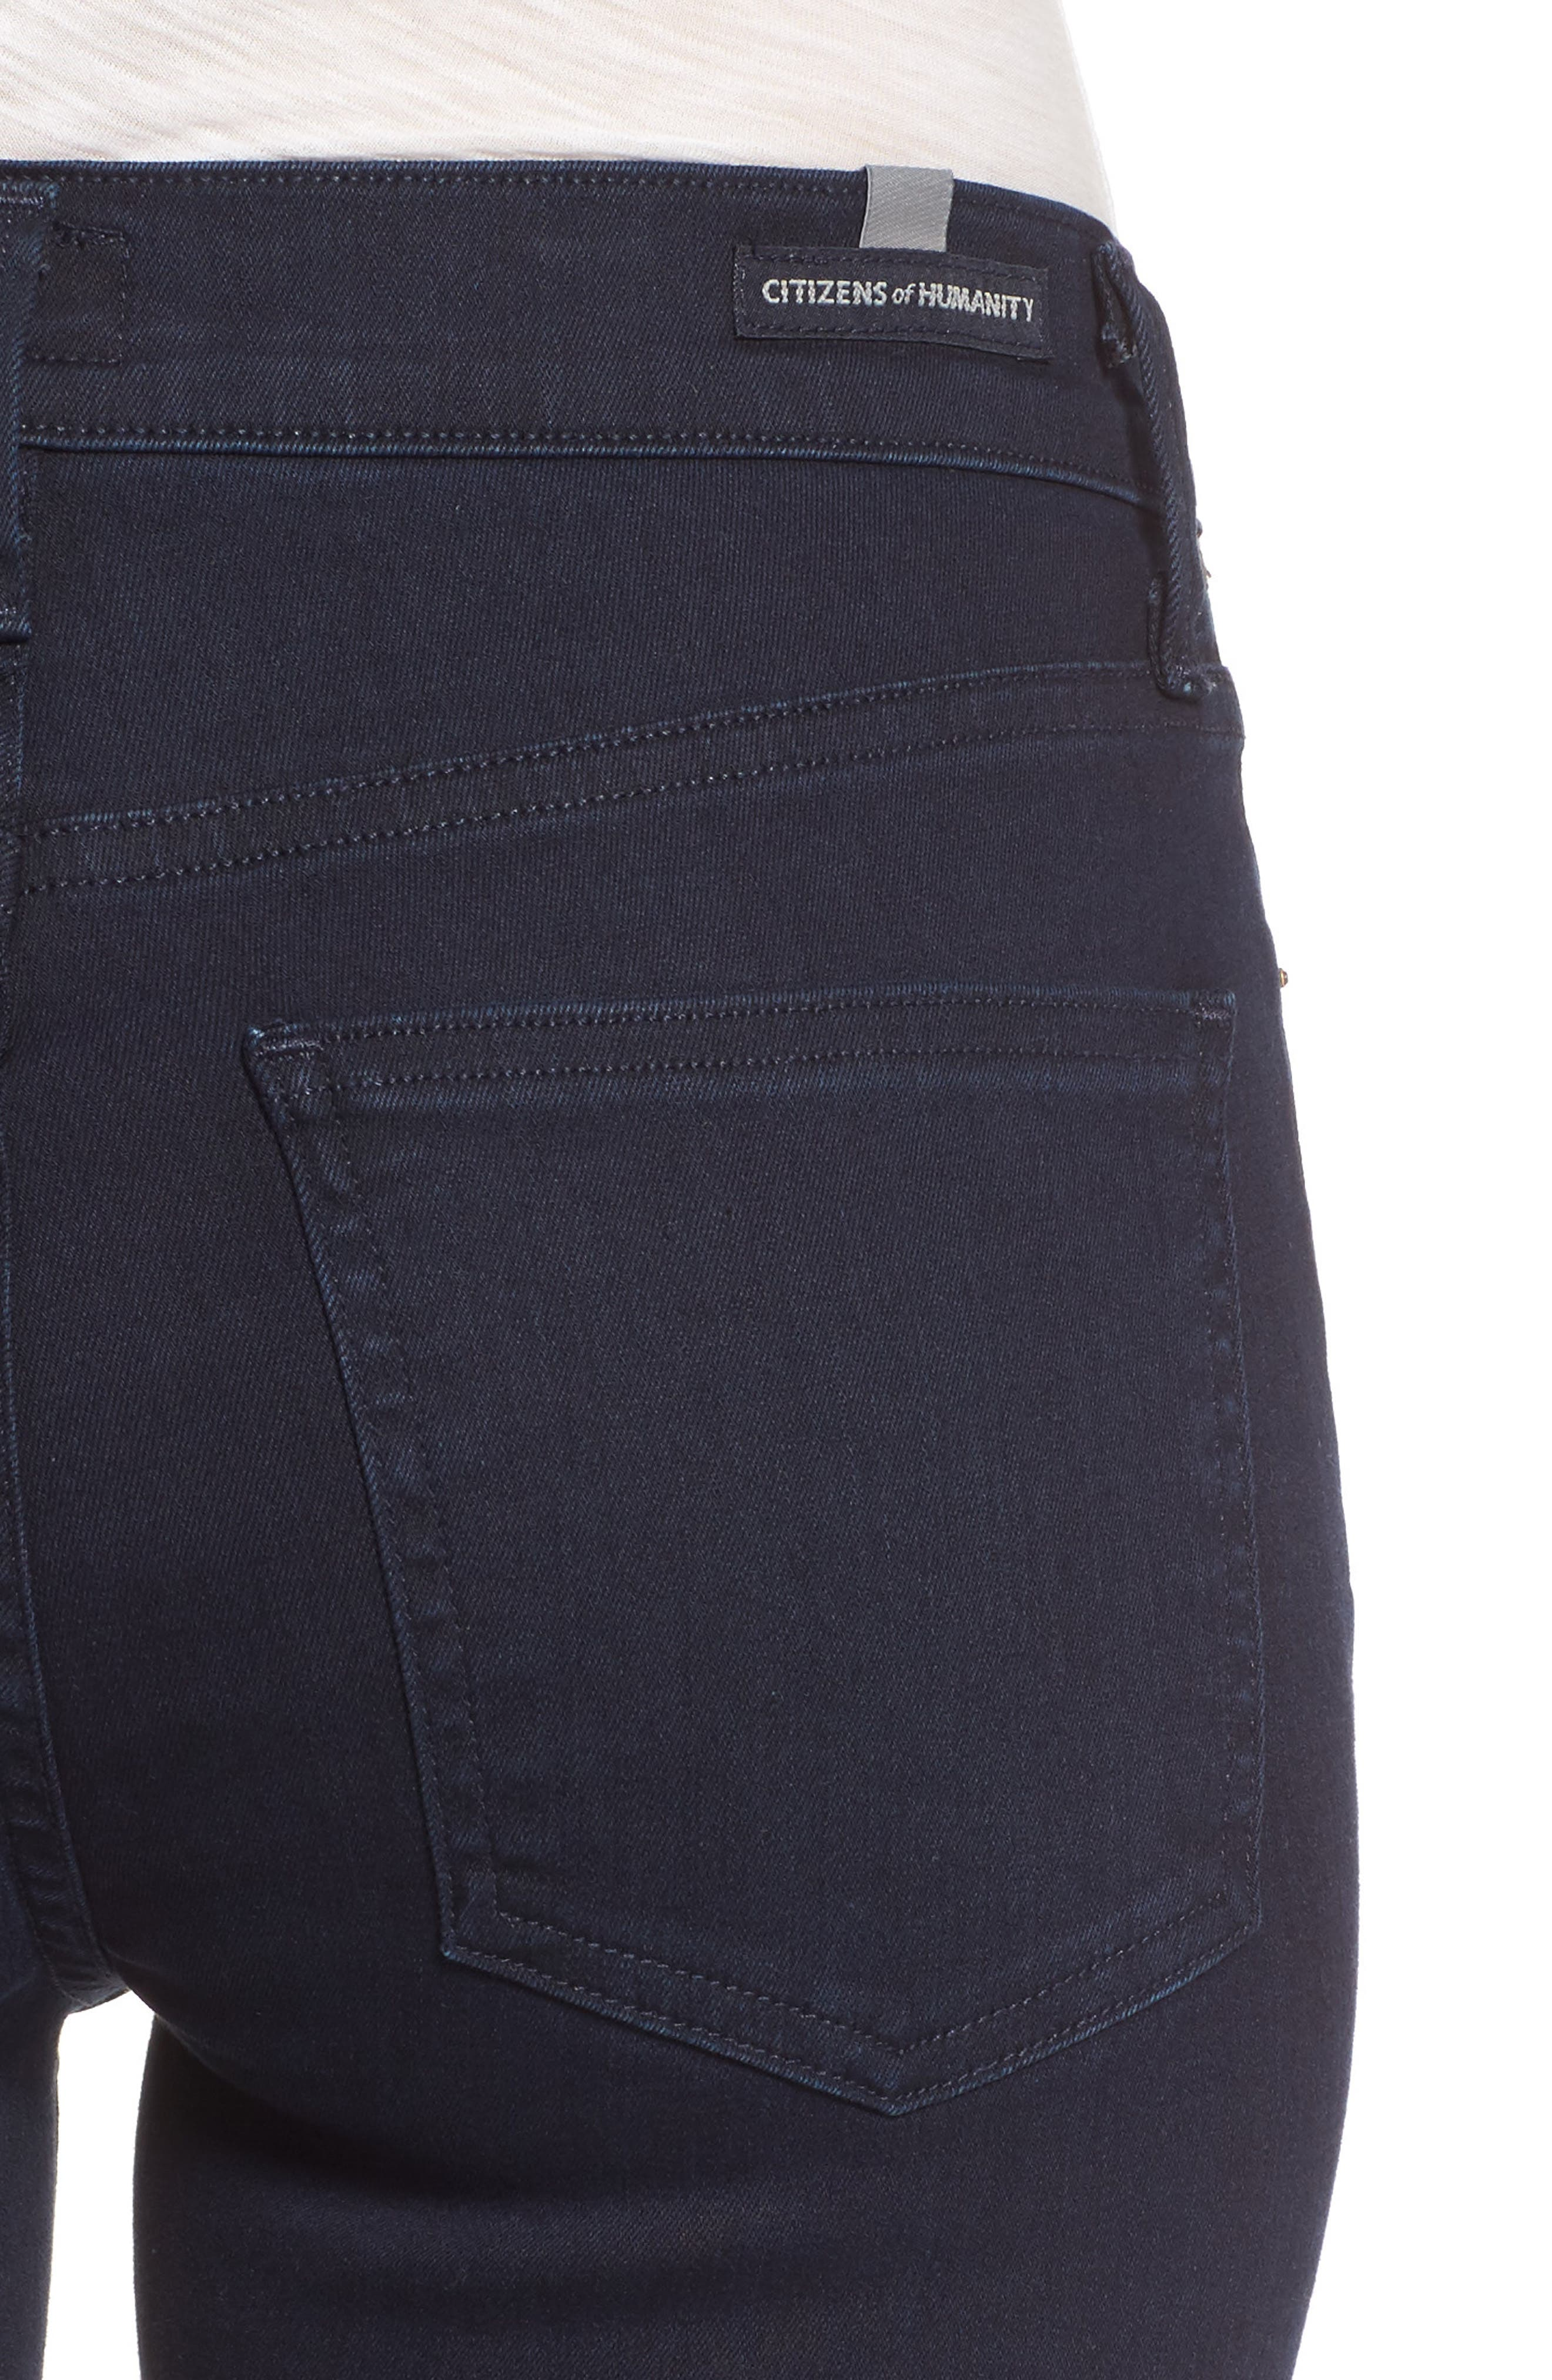 Rocket High Waist Skinny Jeans,                             Alternate thumbnail 4, color,                             409